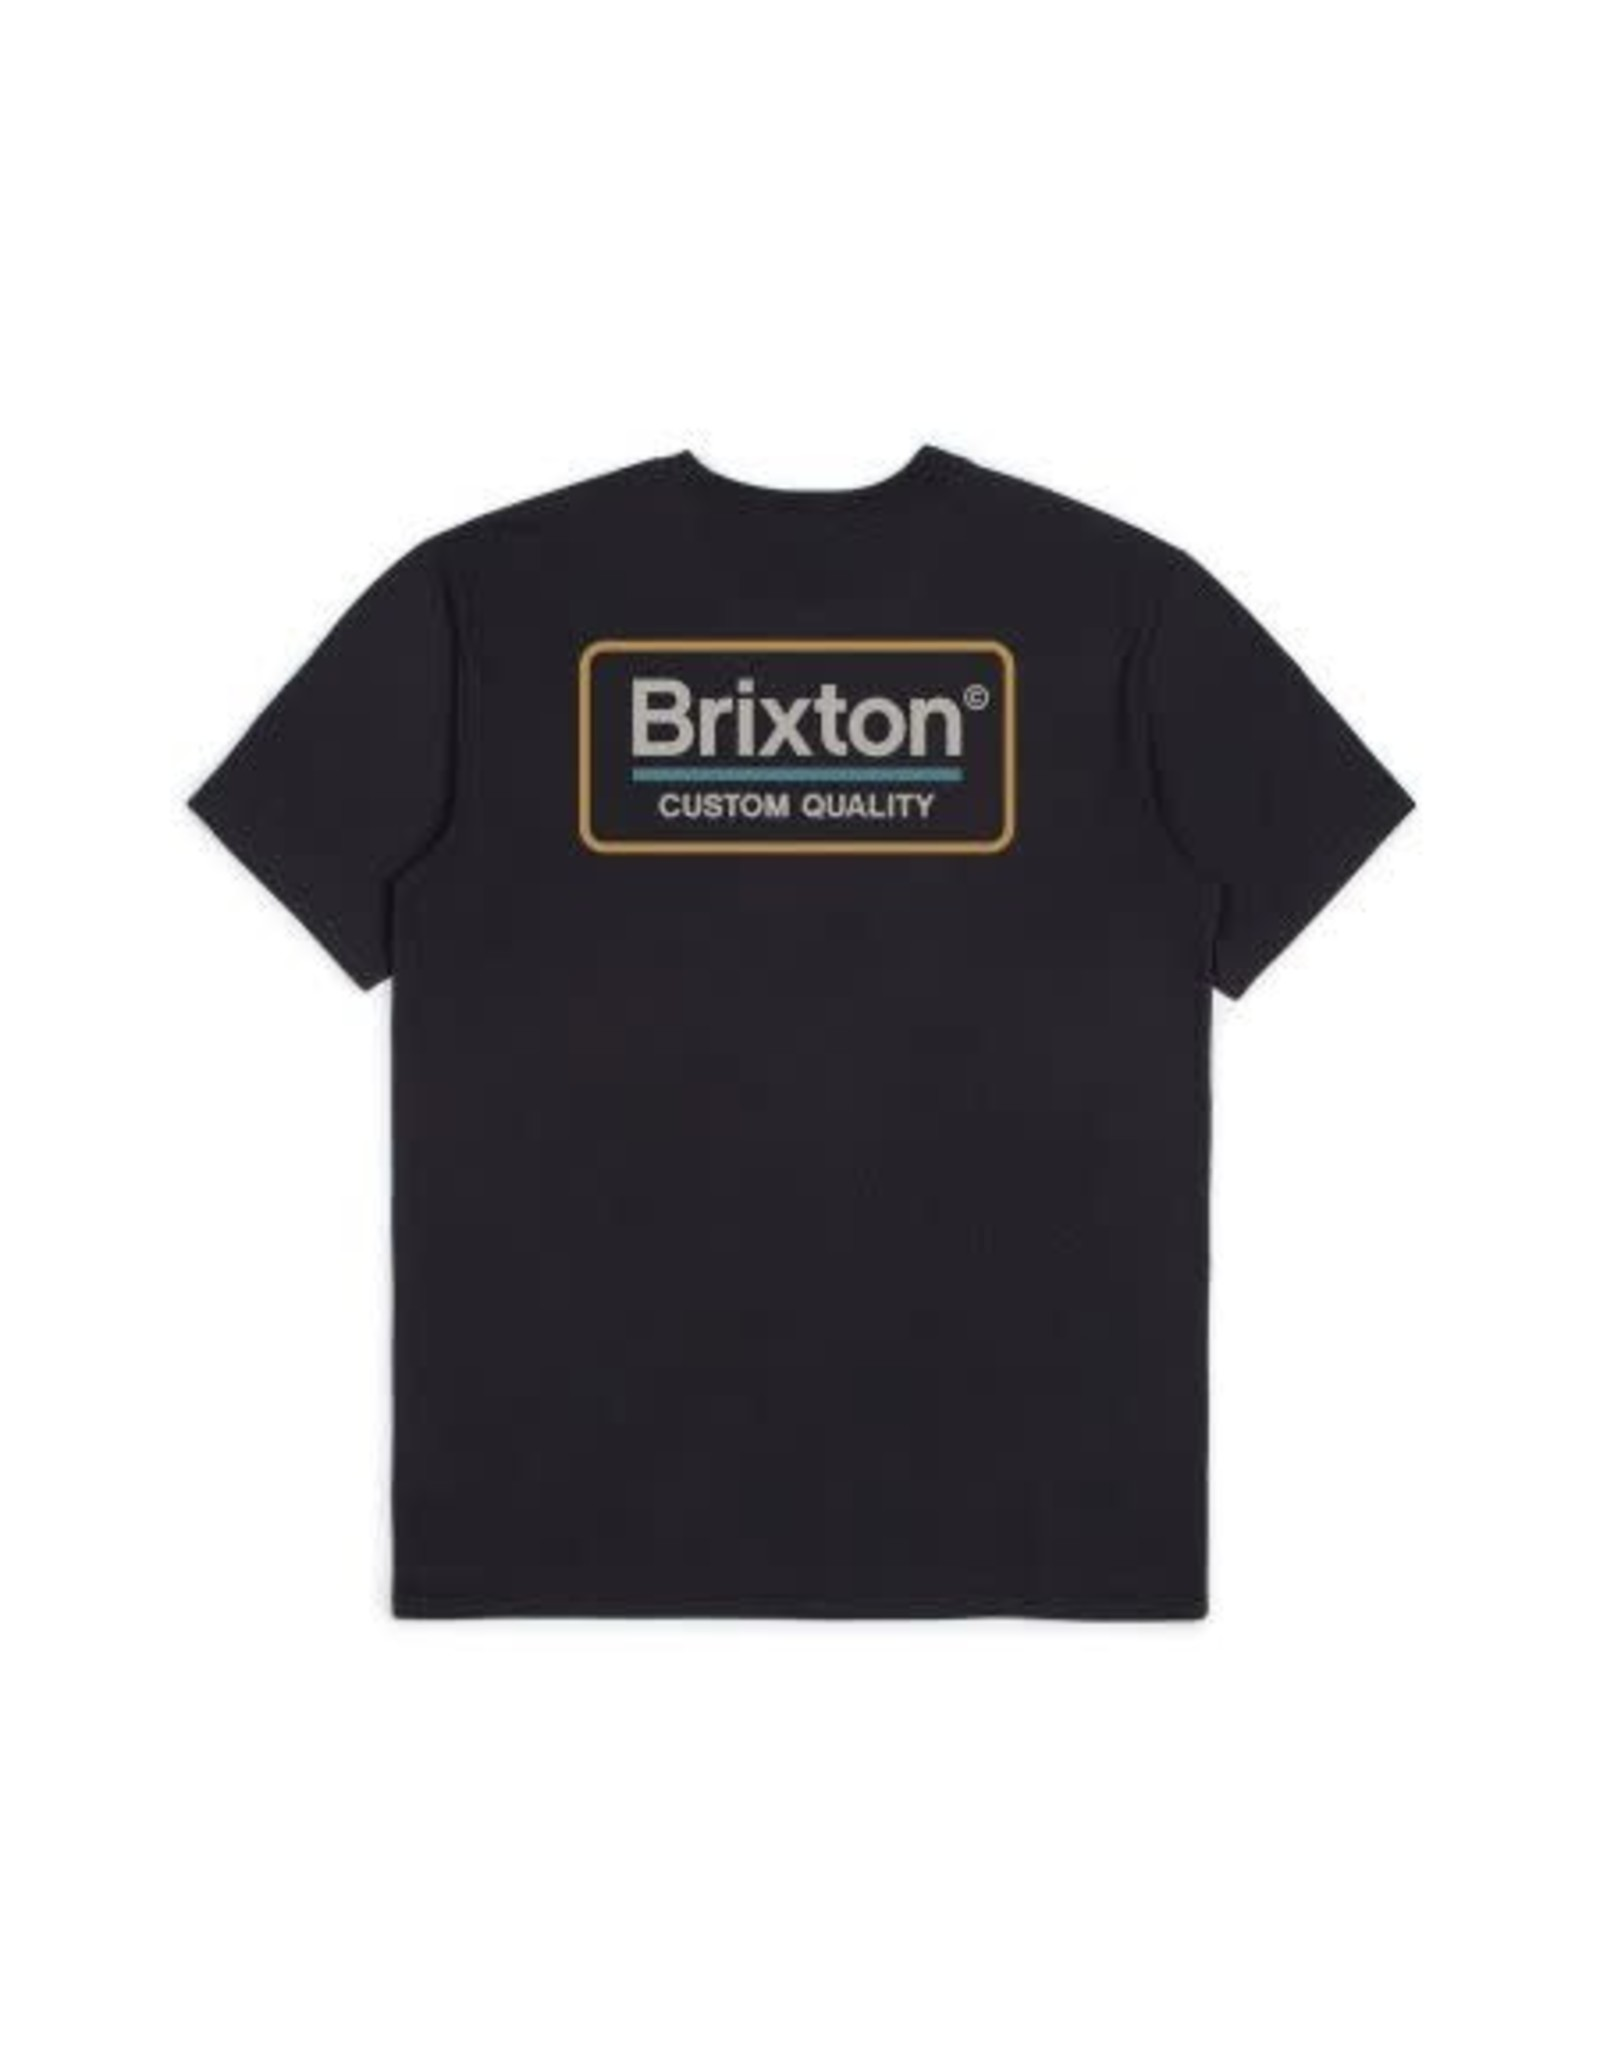 Brixton Brixton - T_shirt homme palmer premium washed black/grey